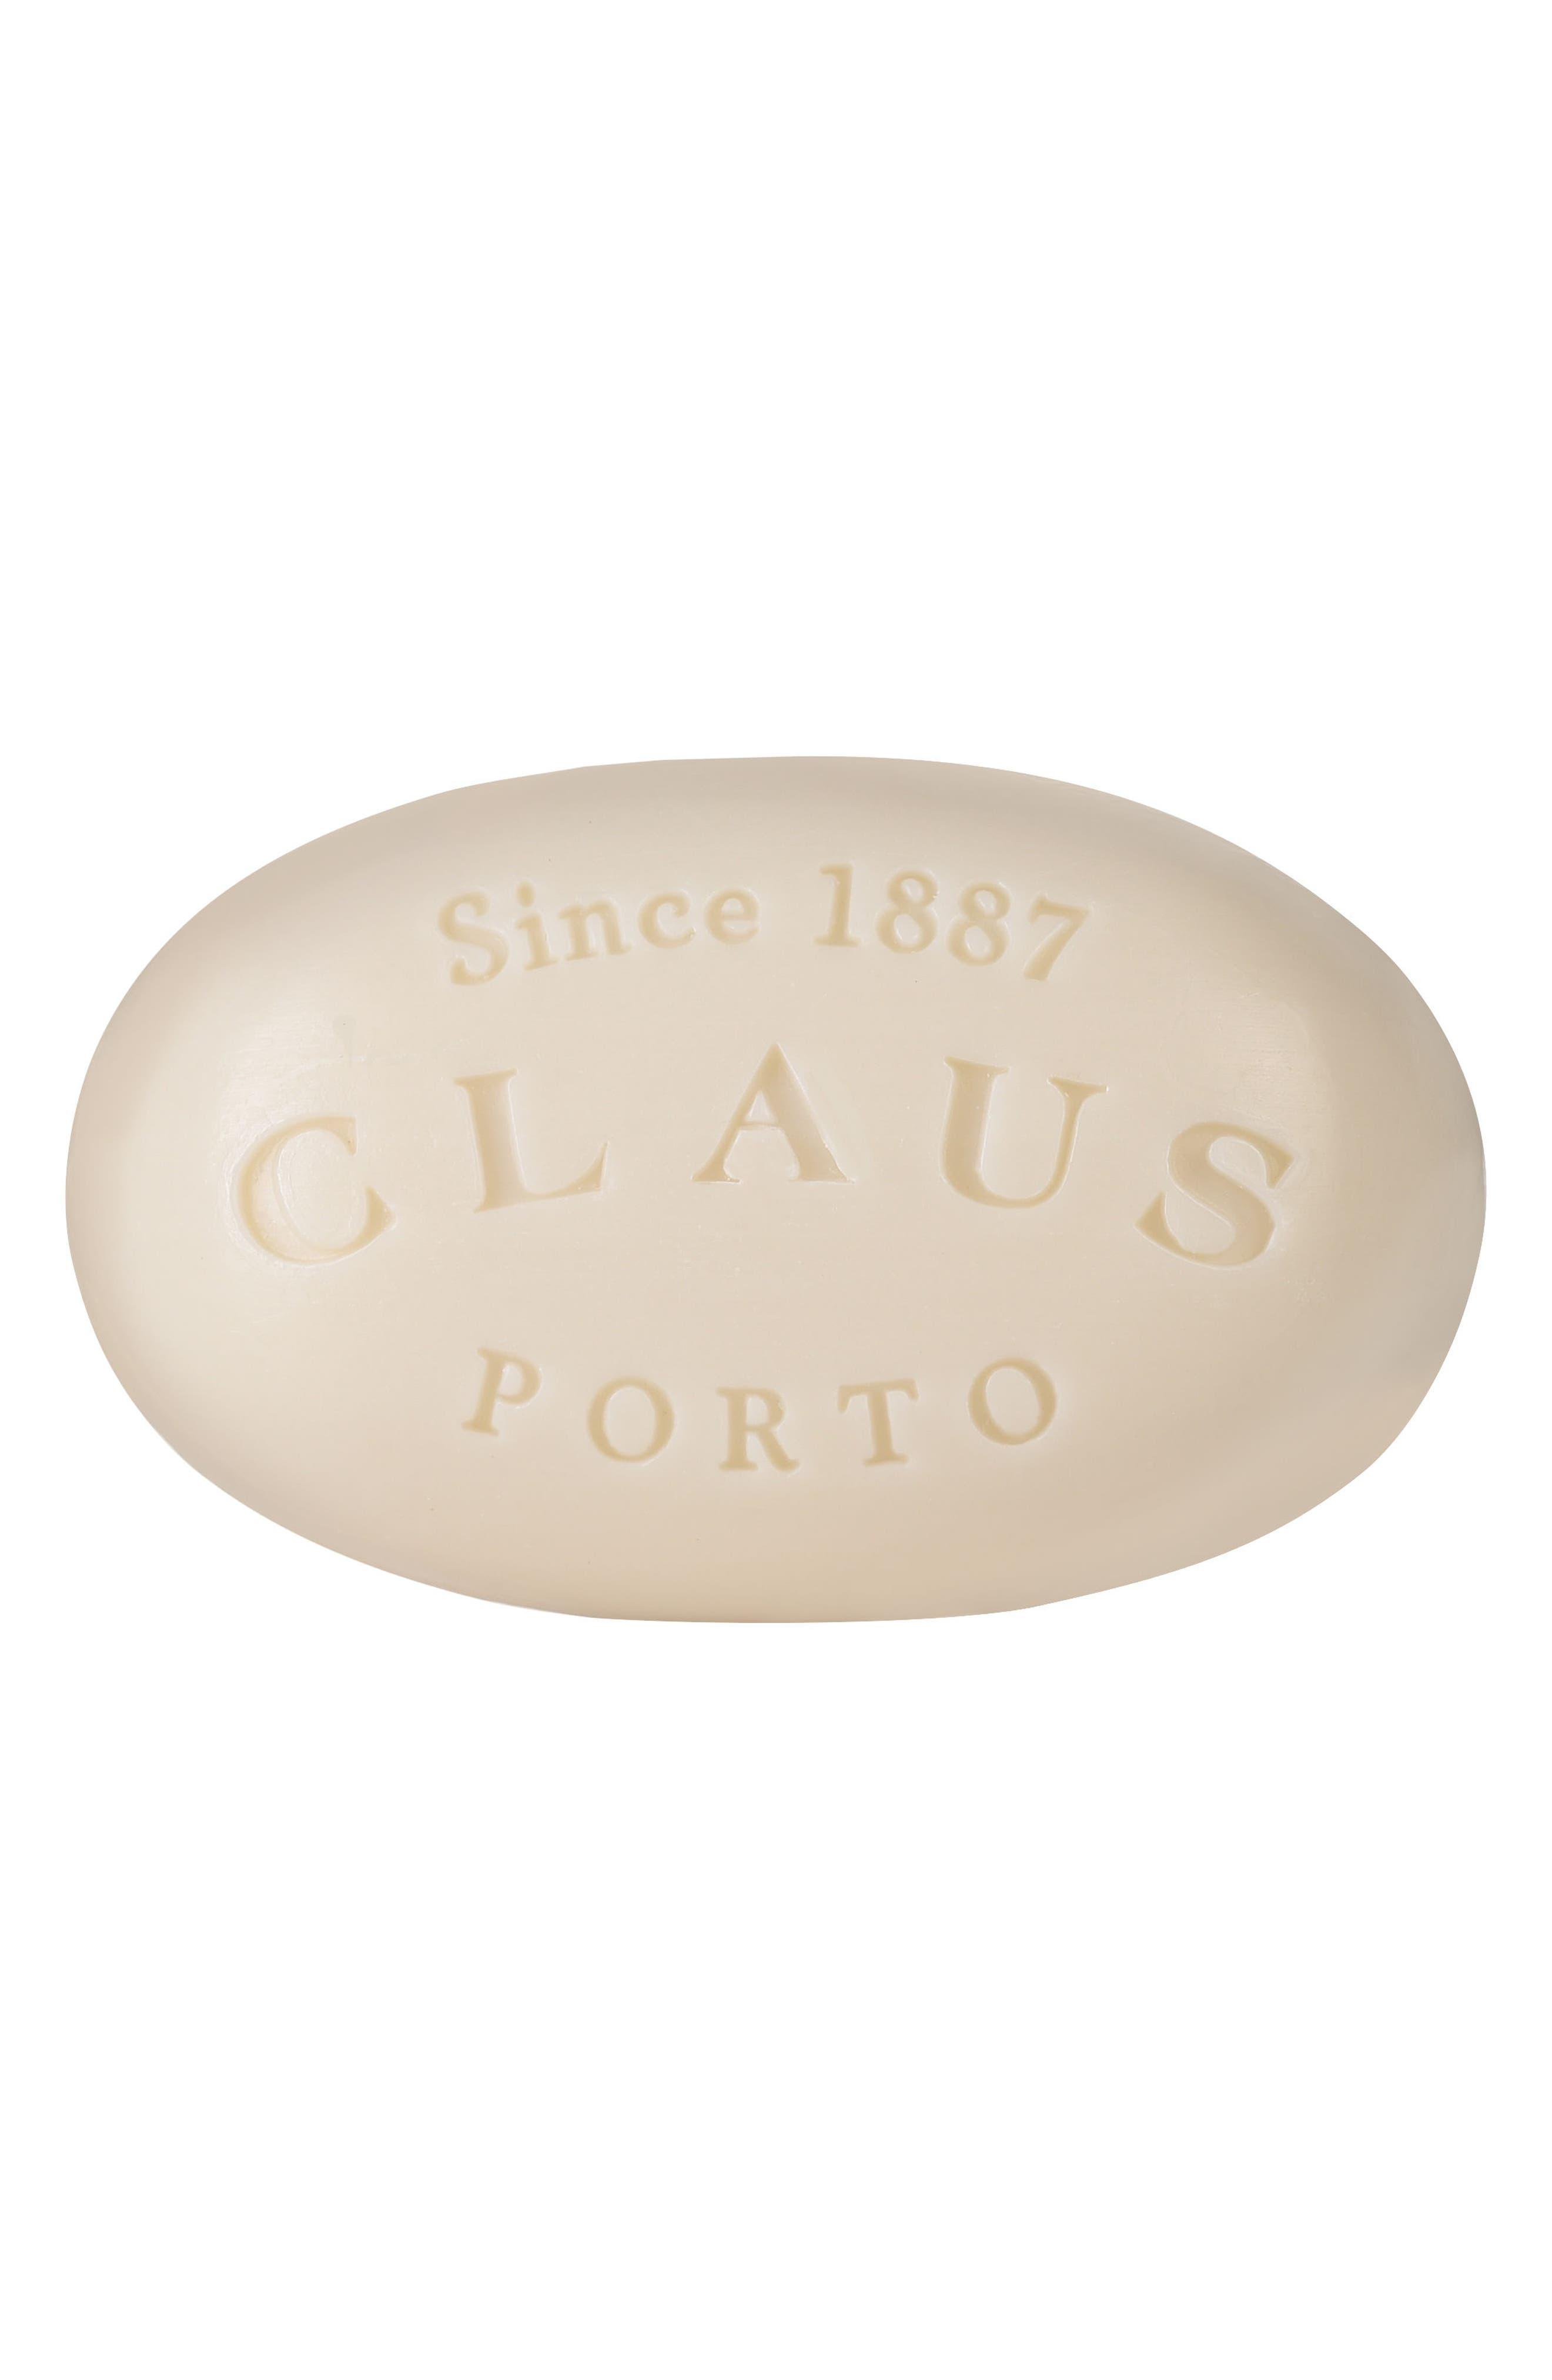 Main Image - Claus Porto Alface Almond Oil Soap